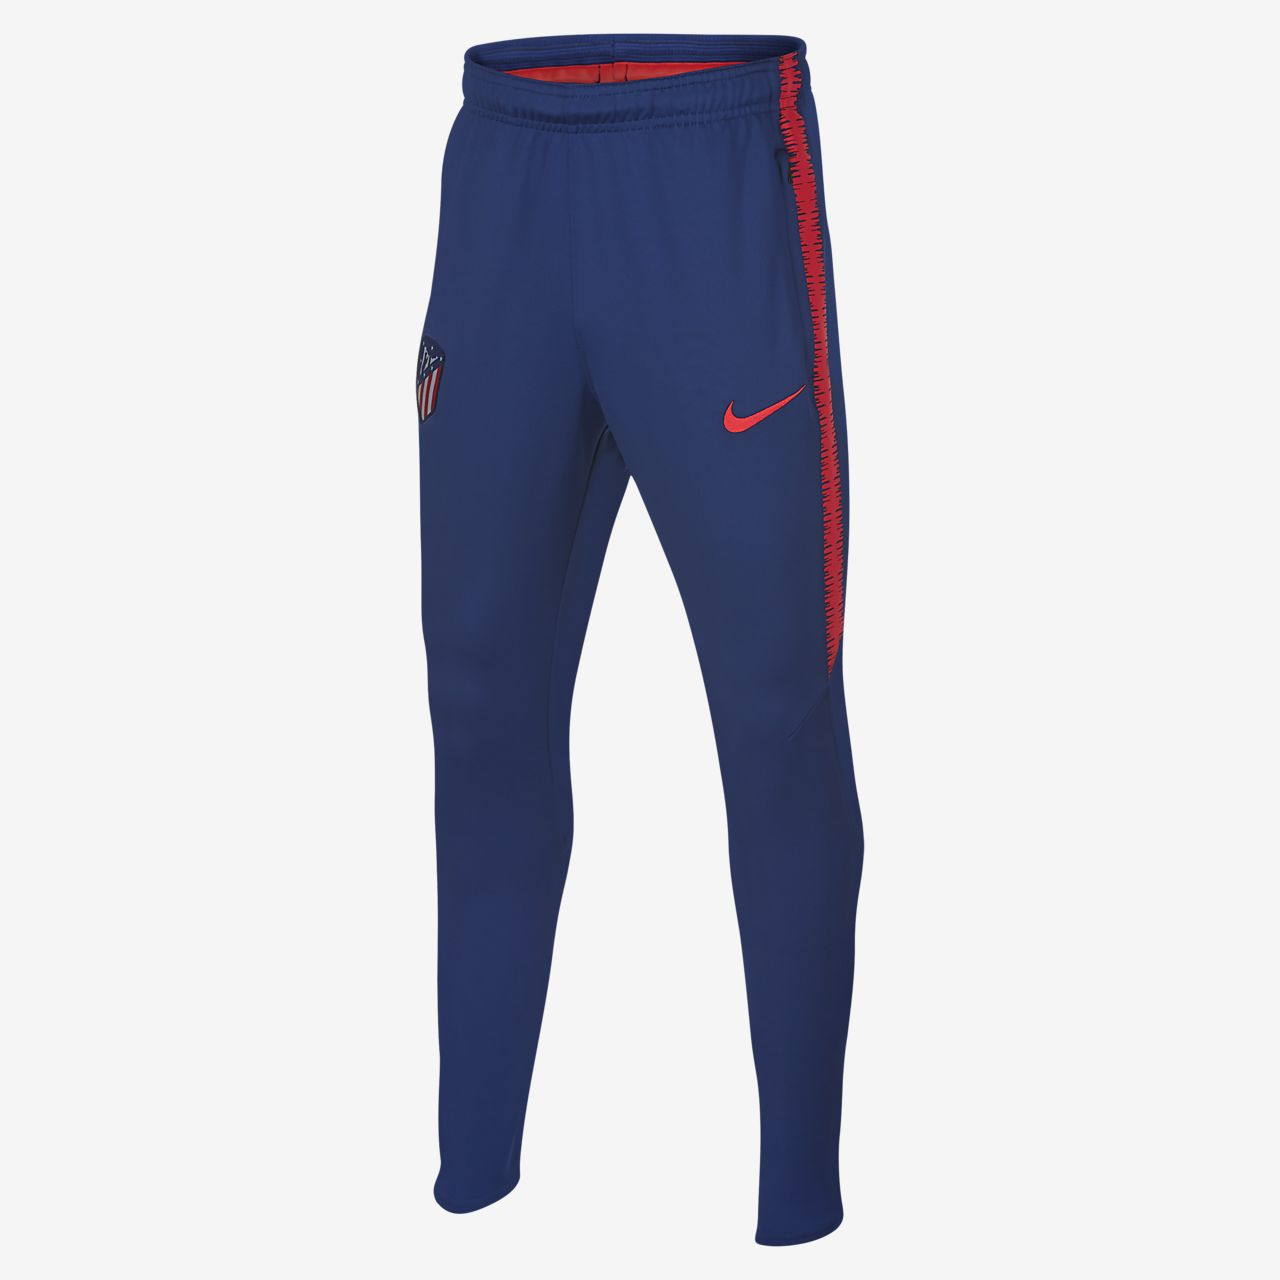 fa3e92cb3eafe ... Pantalones de fútbol para niños talla grande Atlético de Madrid Dri-FIT  Squad